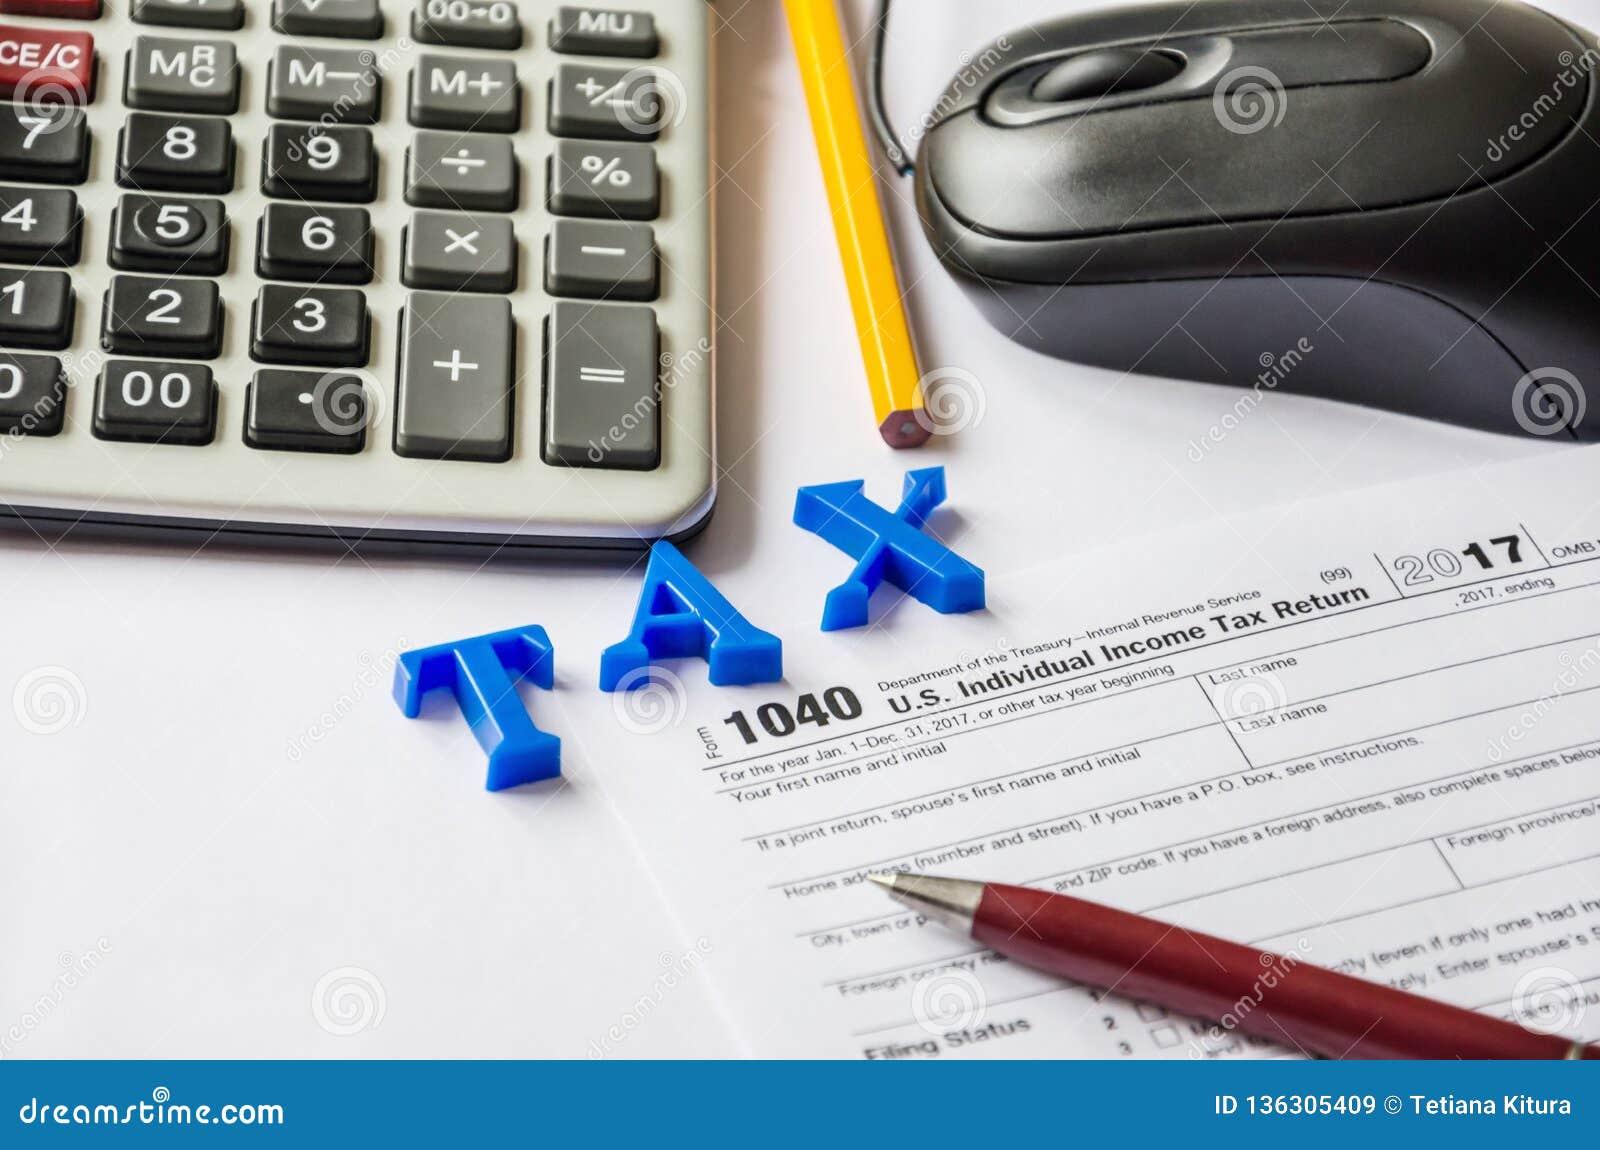 form 1040 calculator  Tax Form 12, Calculator, Pen, Pencil And Computer Mouse ...